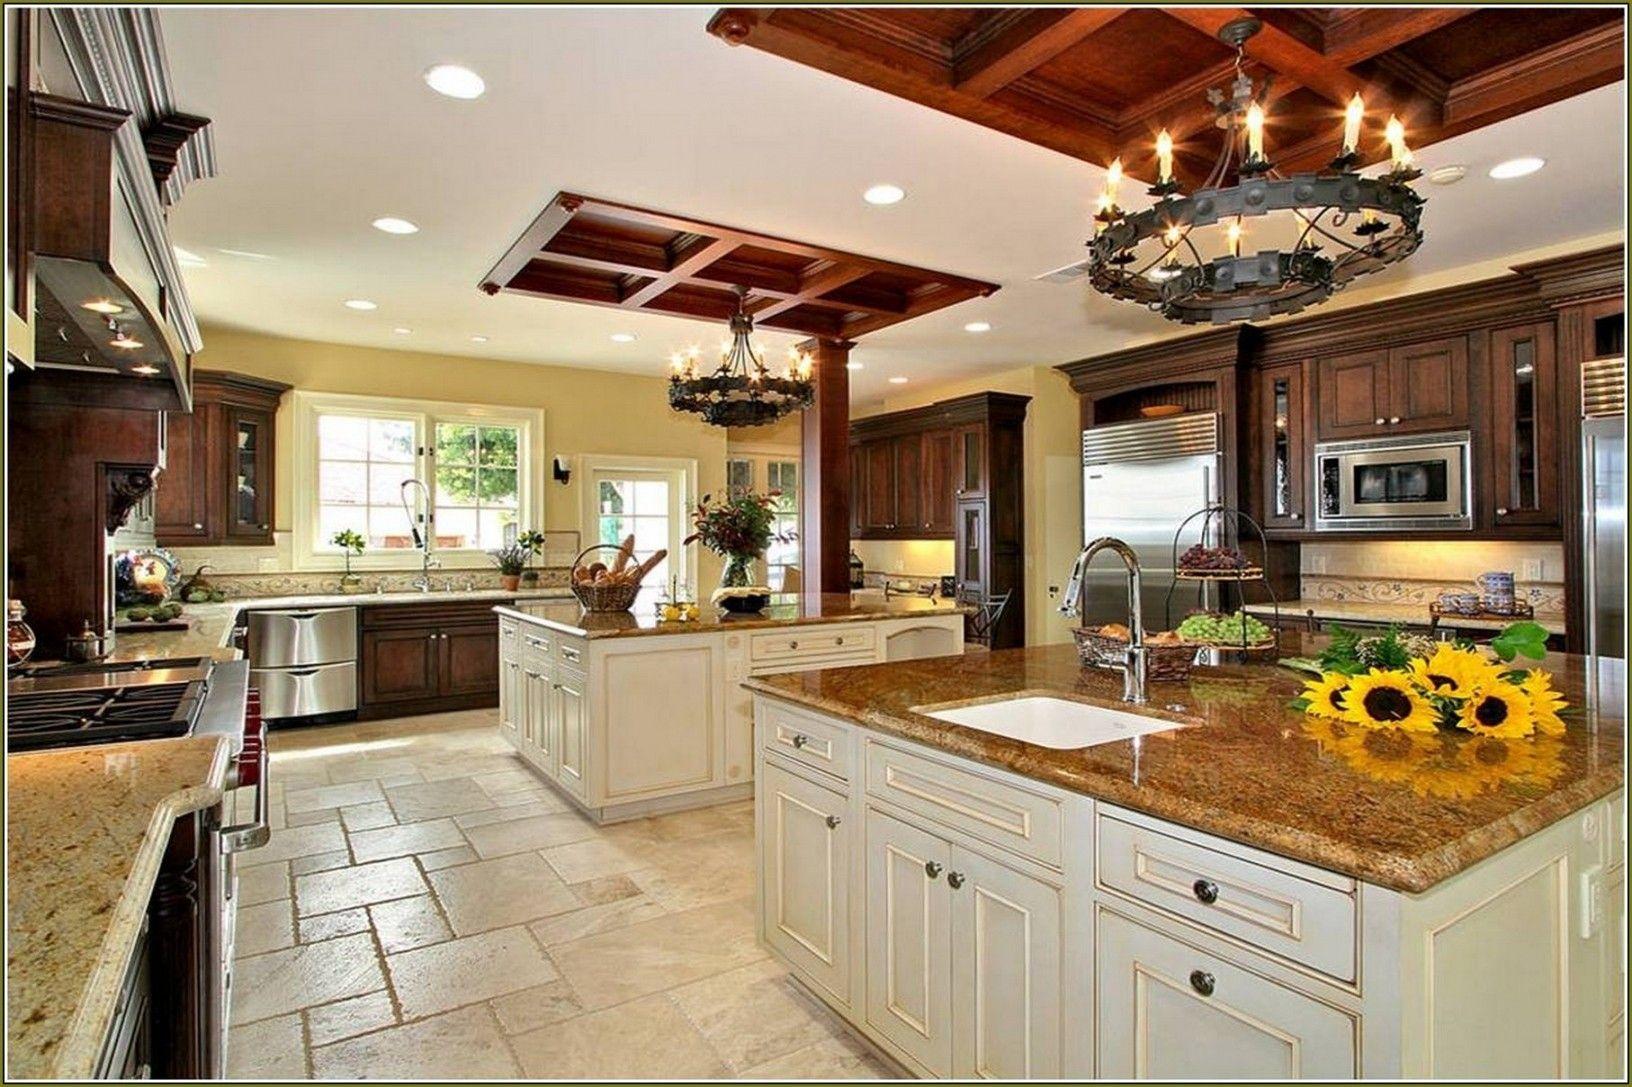 20 Lovely Summer Kitchens Home depot kitchen, Kitchen